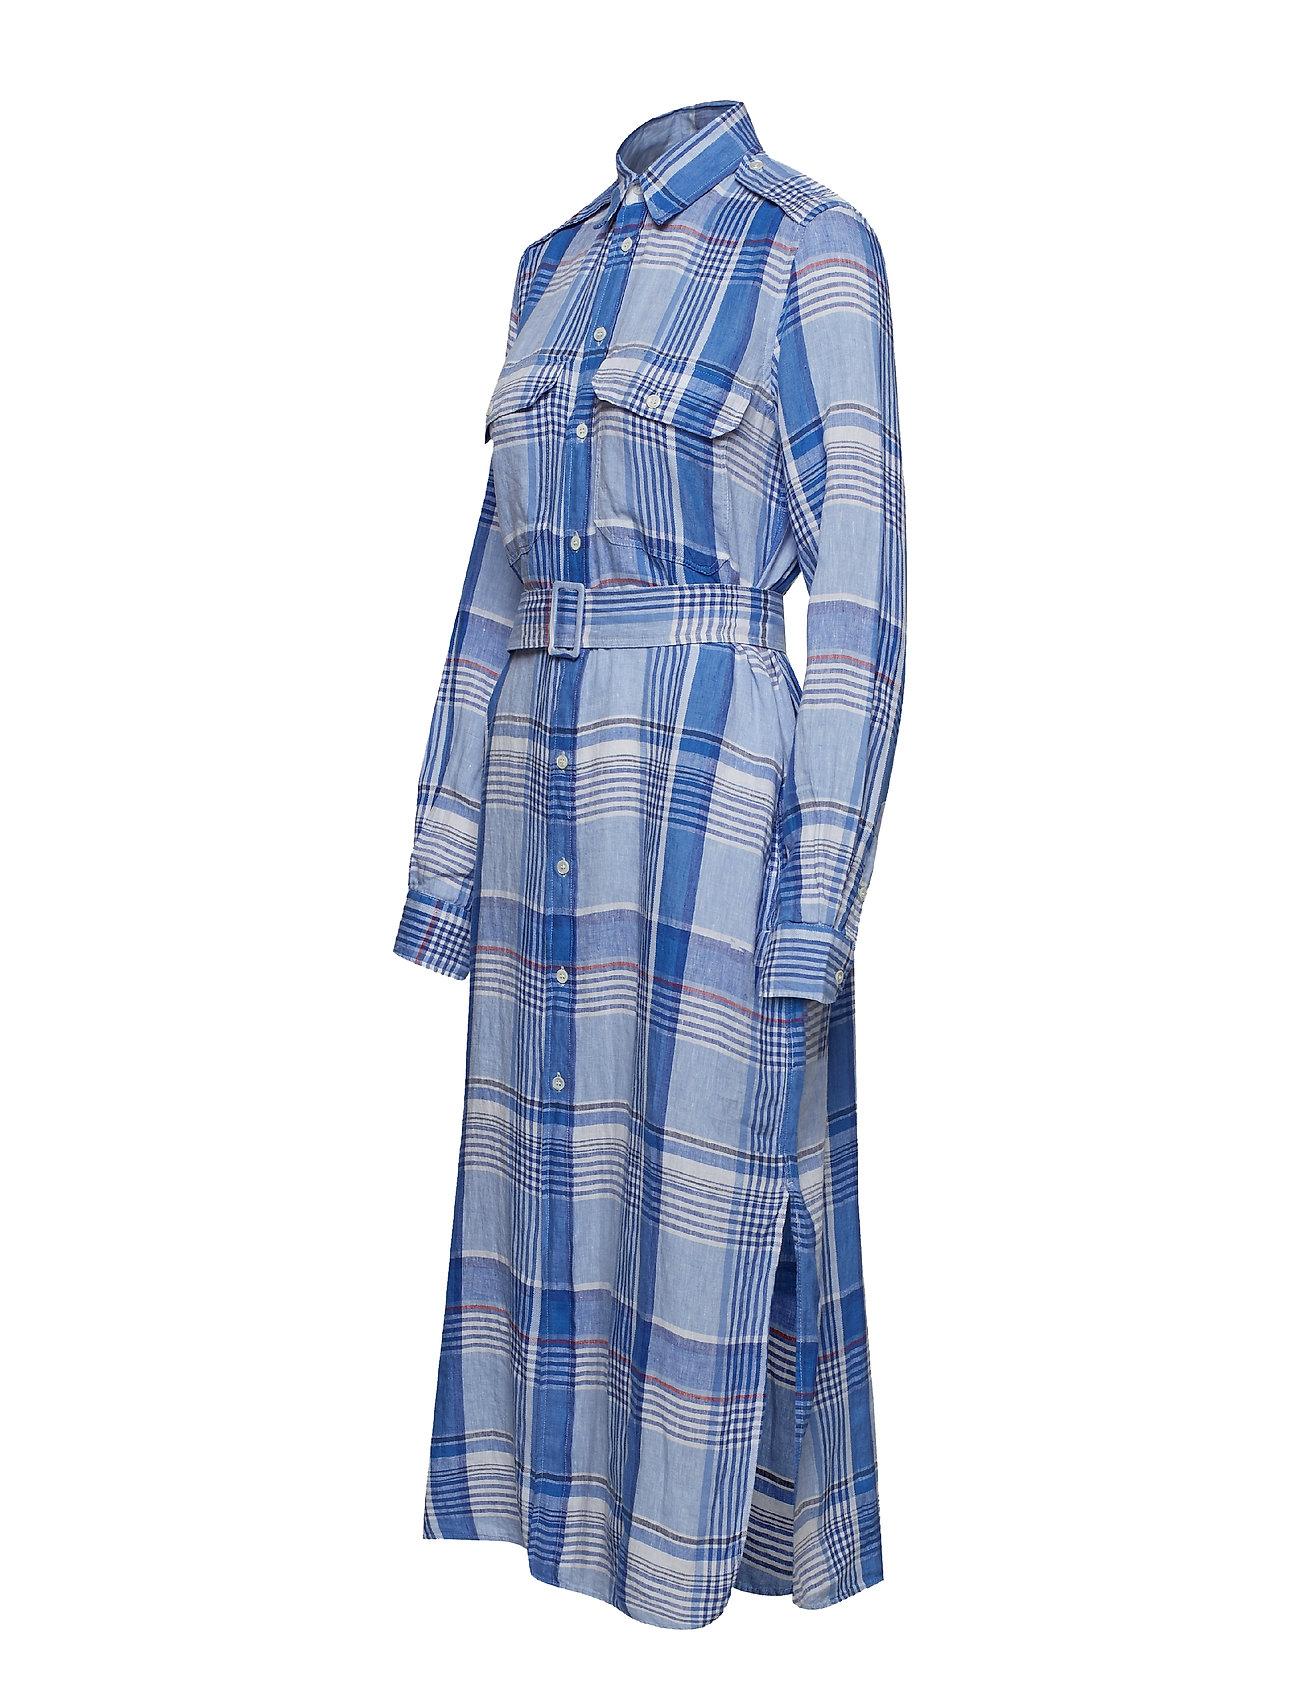 Ralph Linen Lauren Royal Plaid oceanPolo Shirtdress3270 0X8wPknO